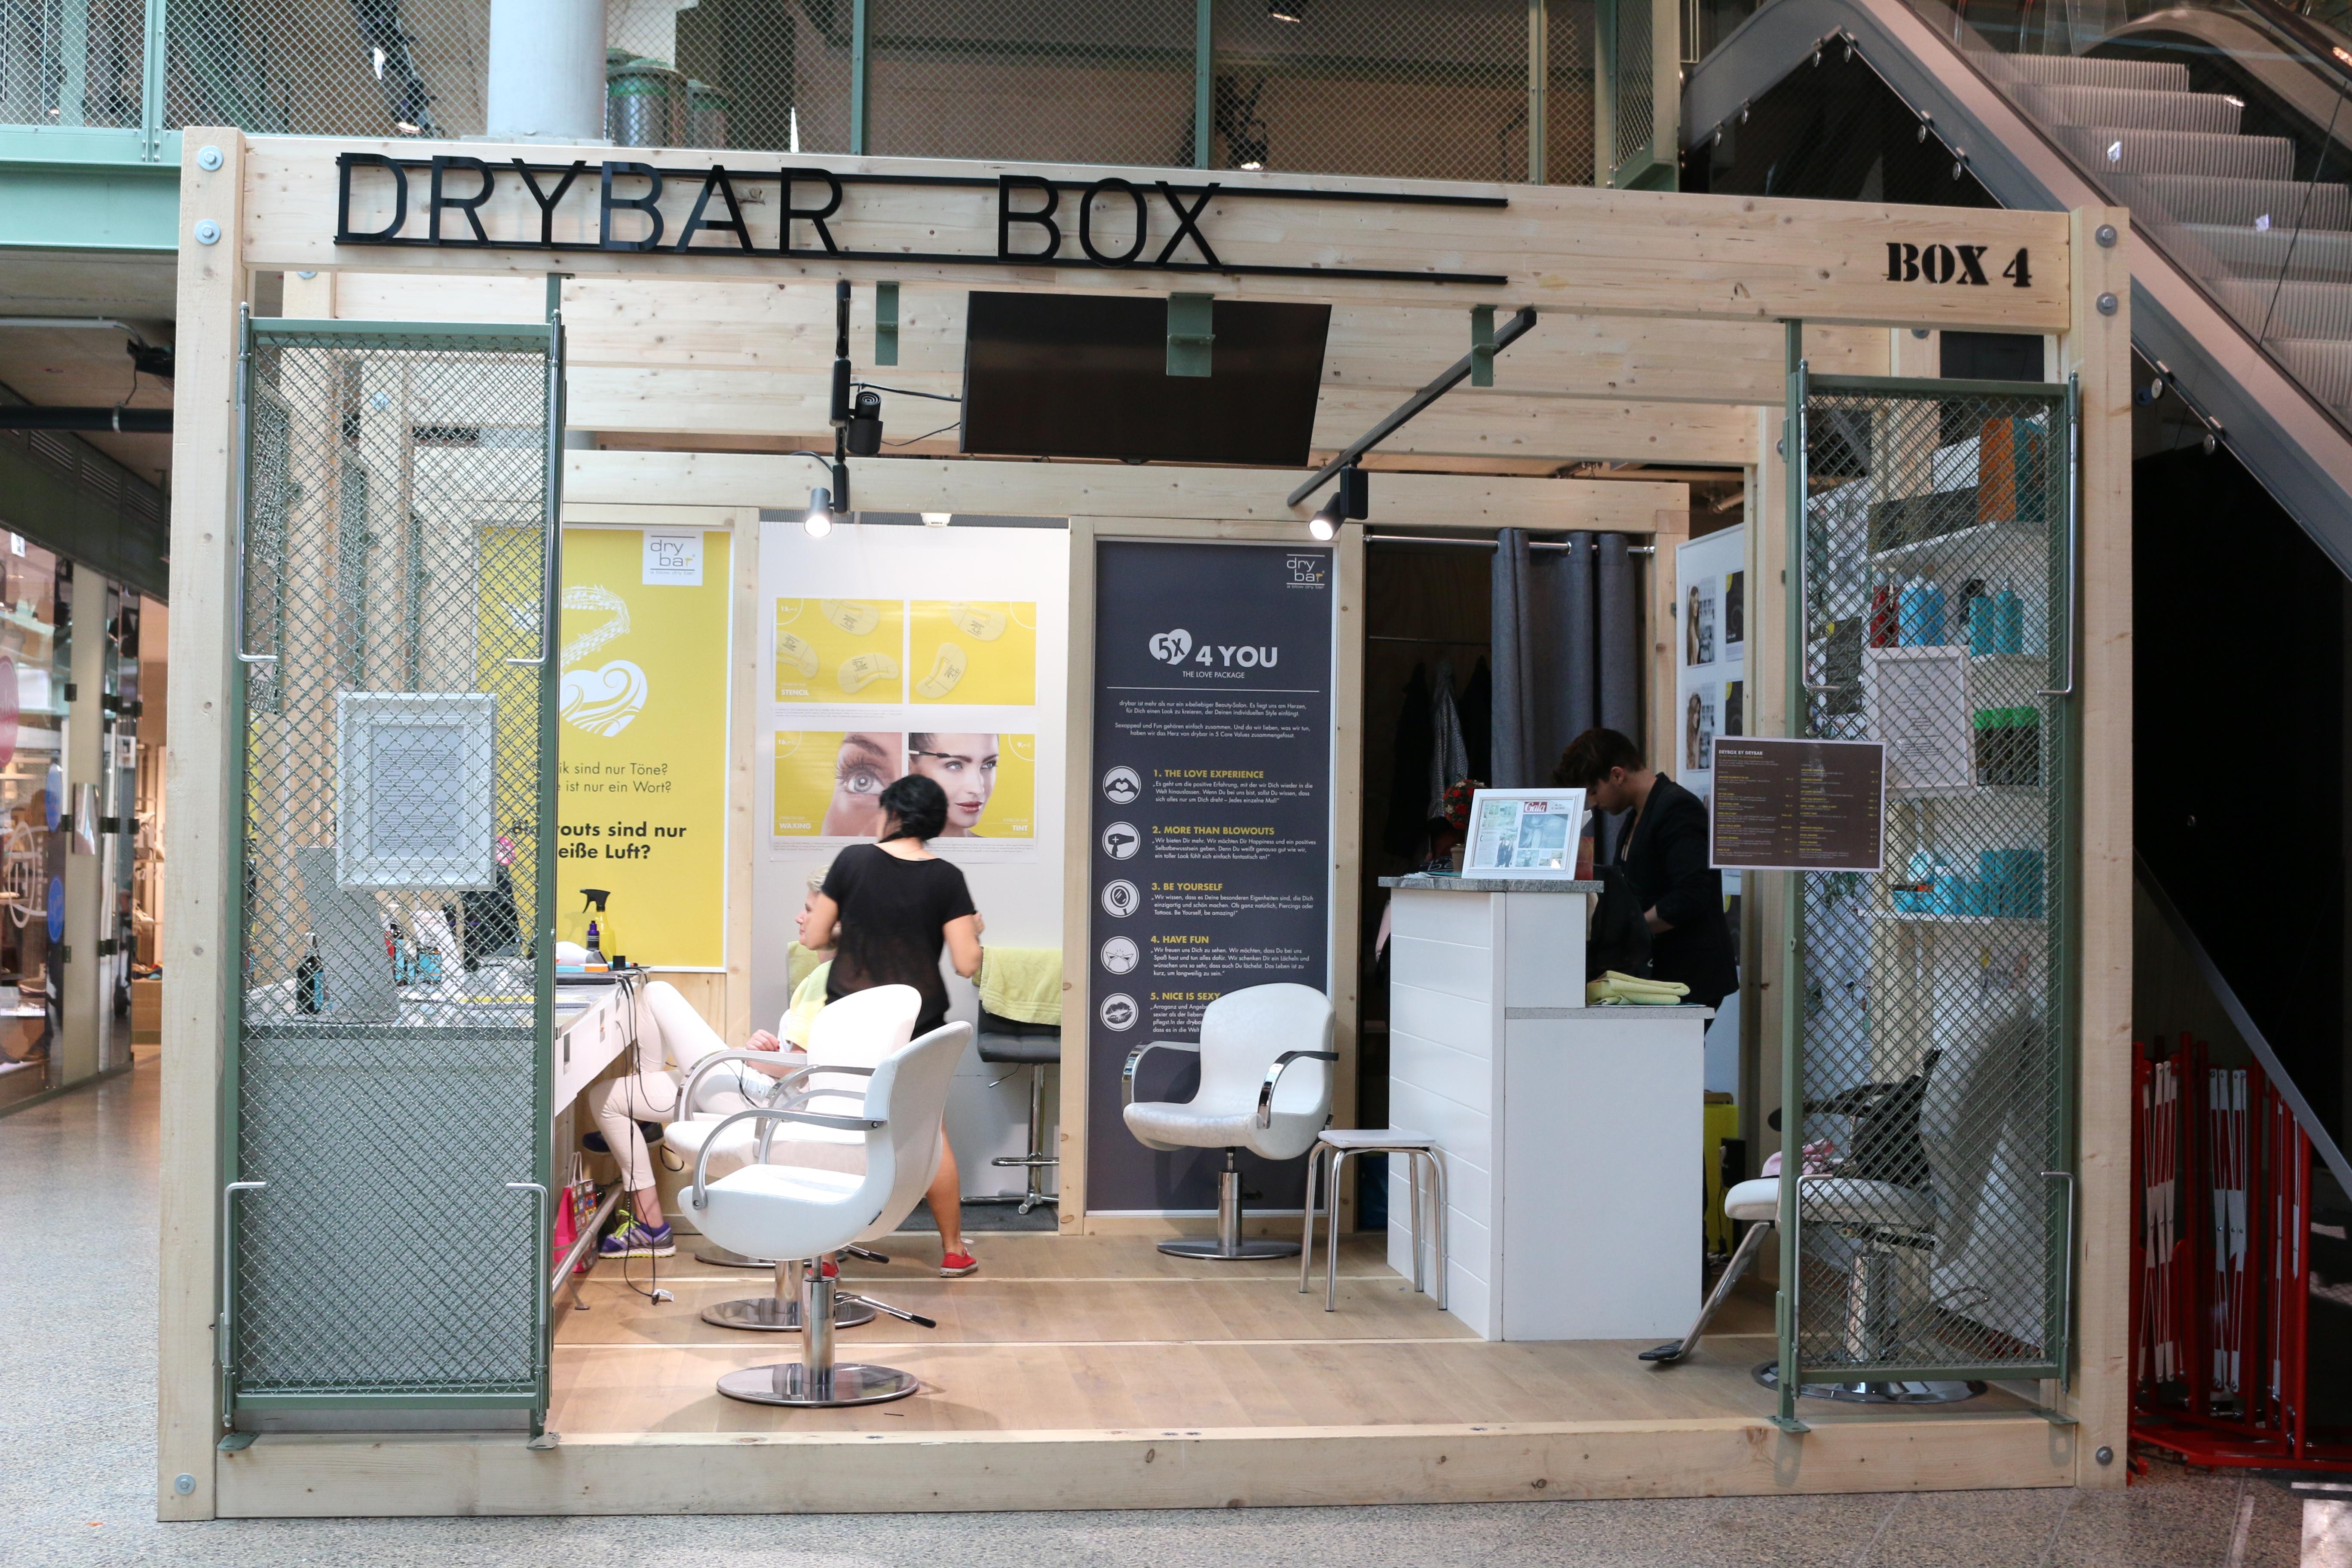 Mercedes Benz Fashion Week - Day 4 - novalanalove